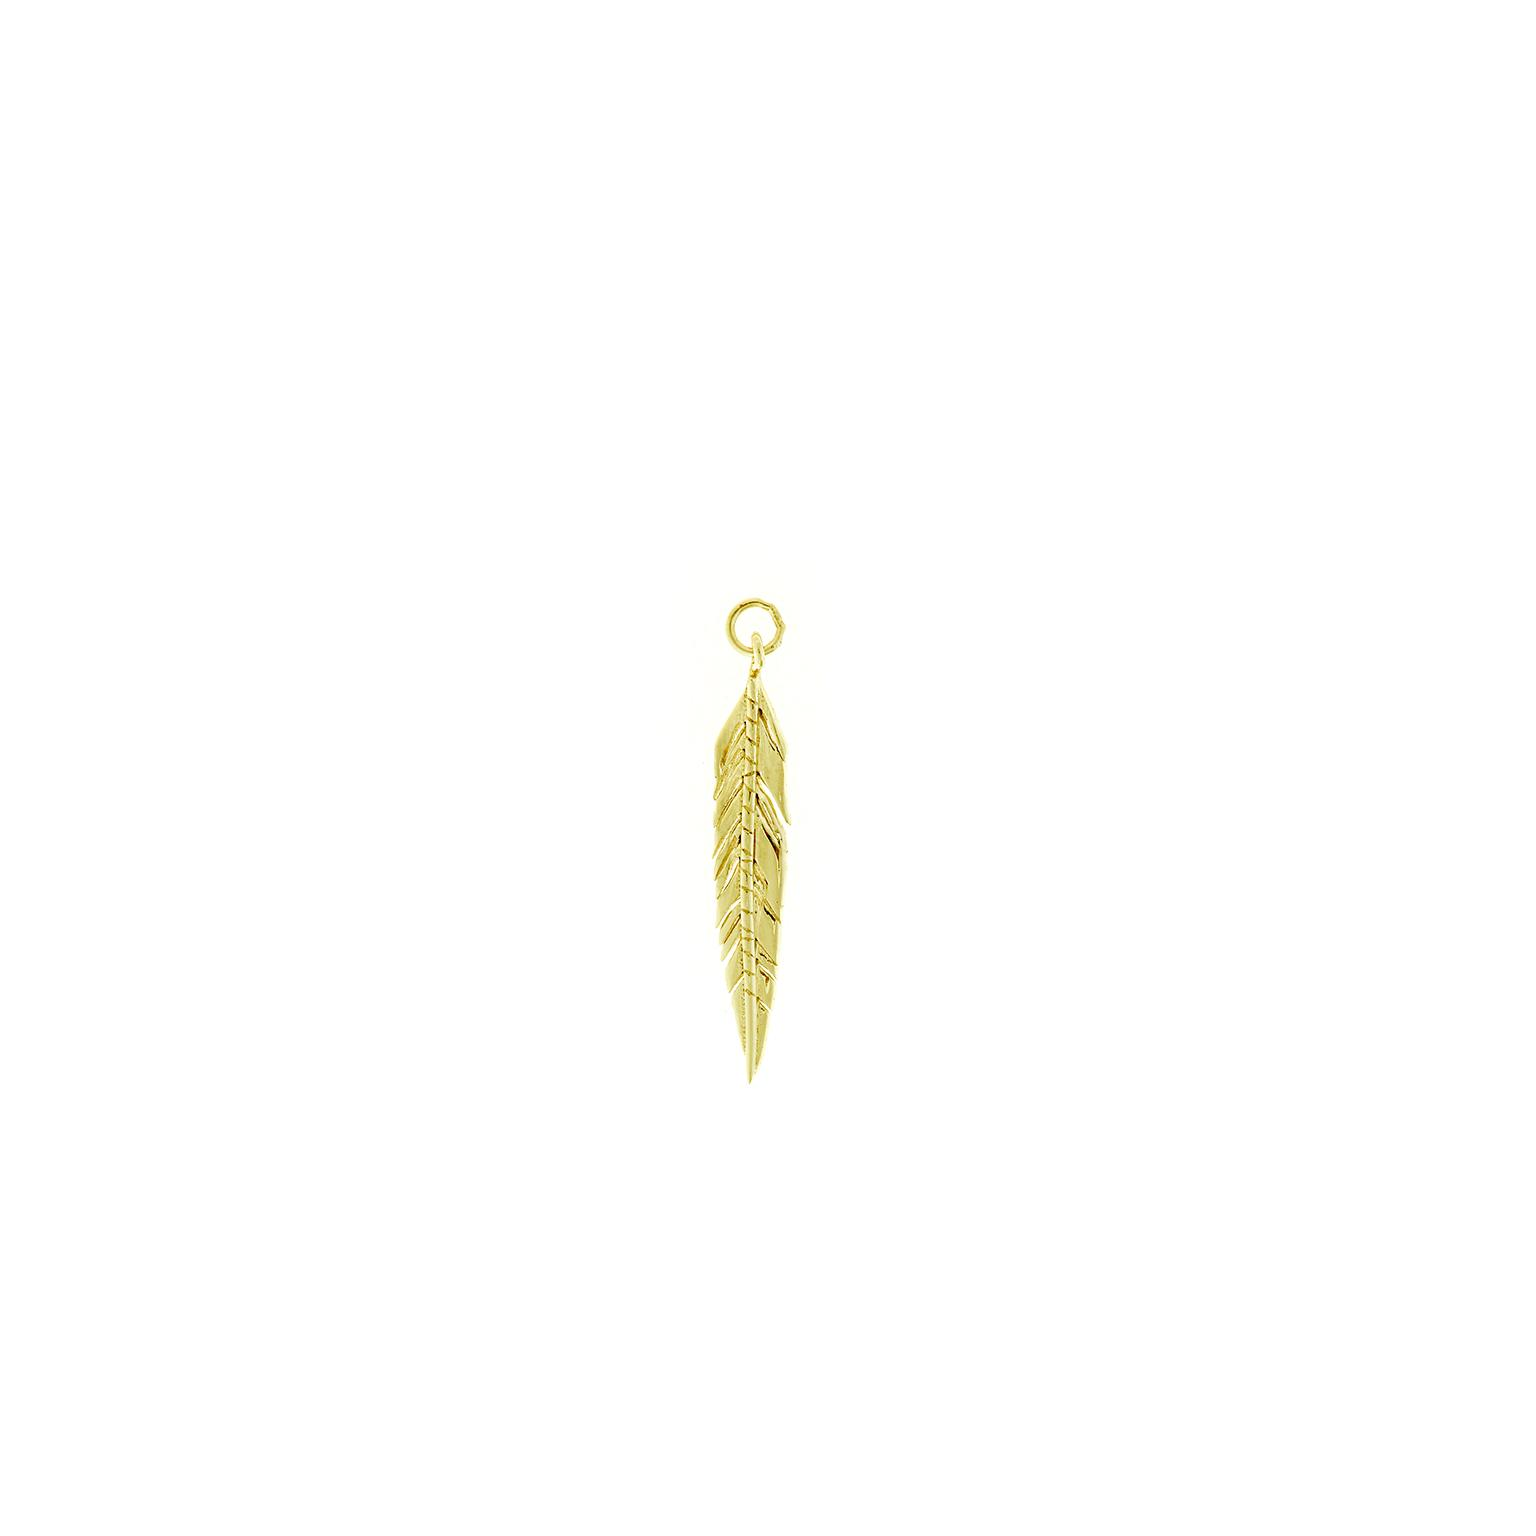 Charm plata Salvatore dorado con forma de pluma estilada